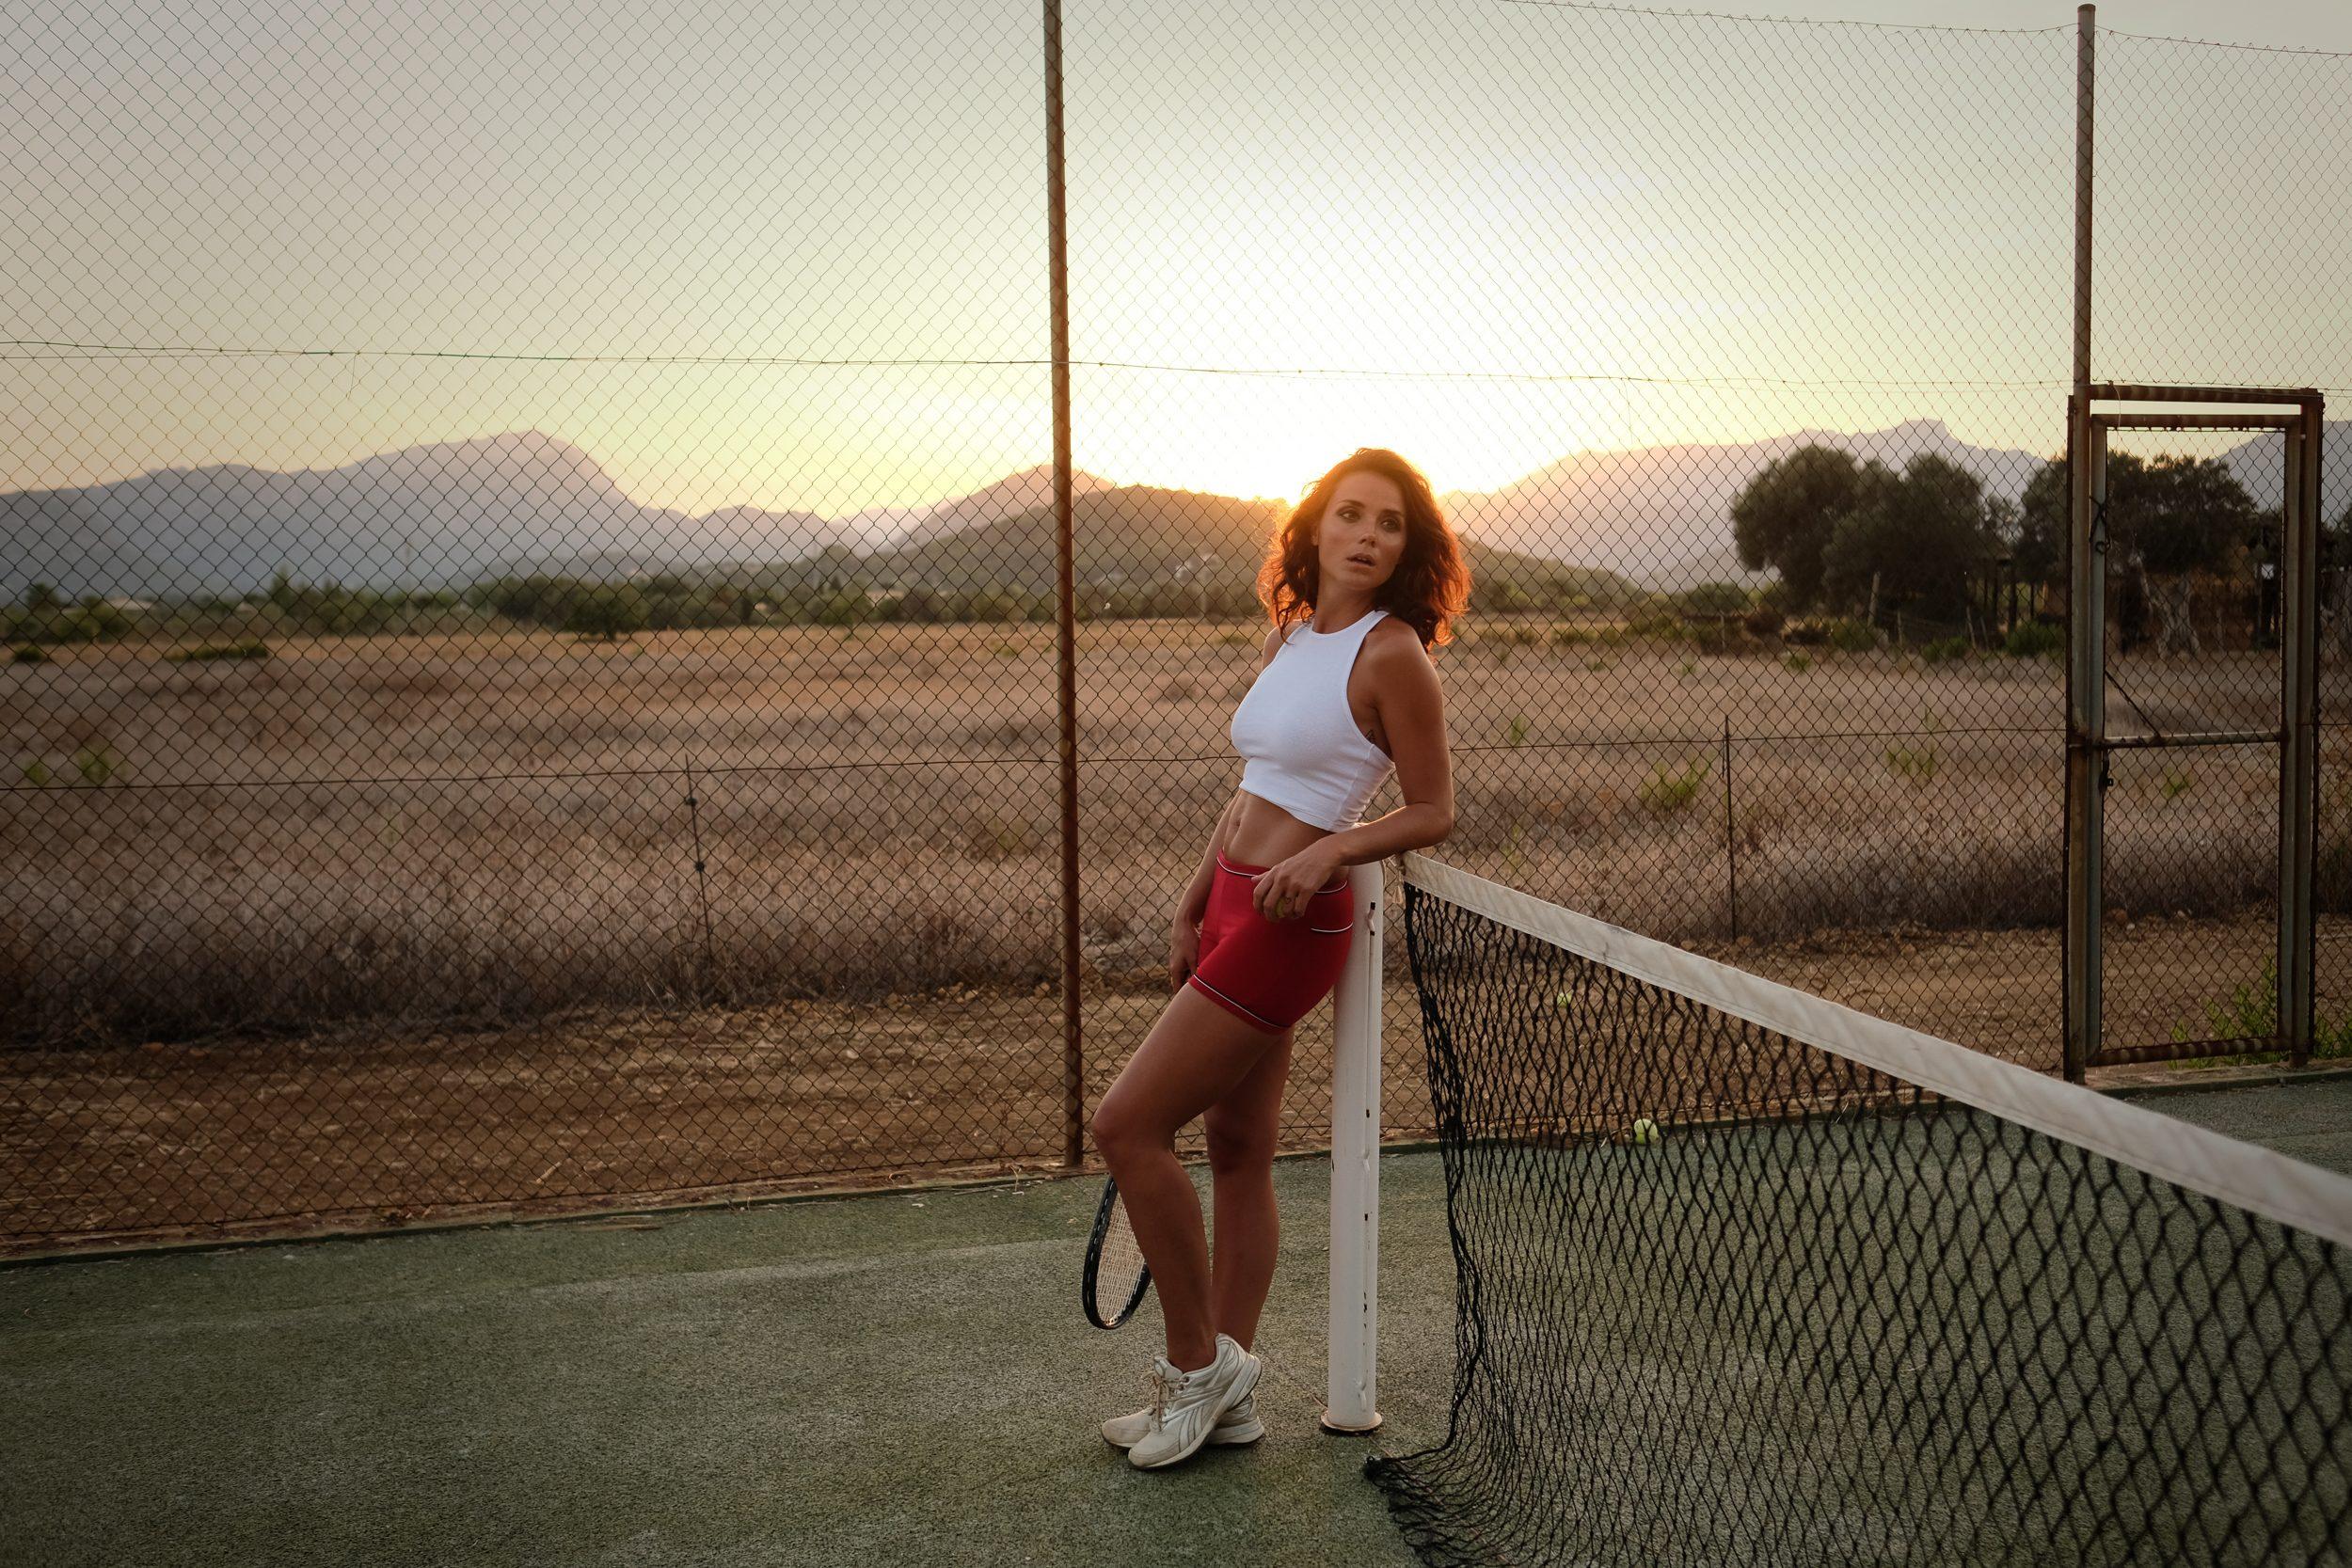 Lifestyle & Sport